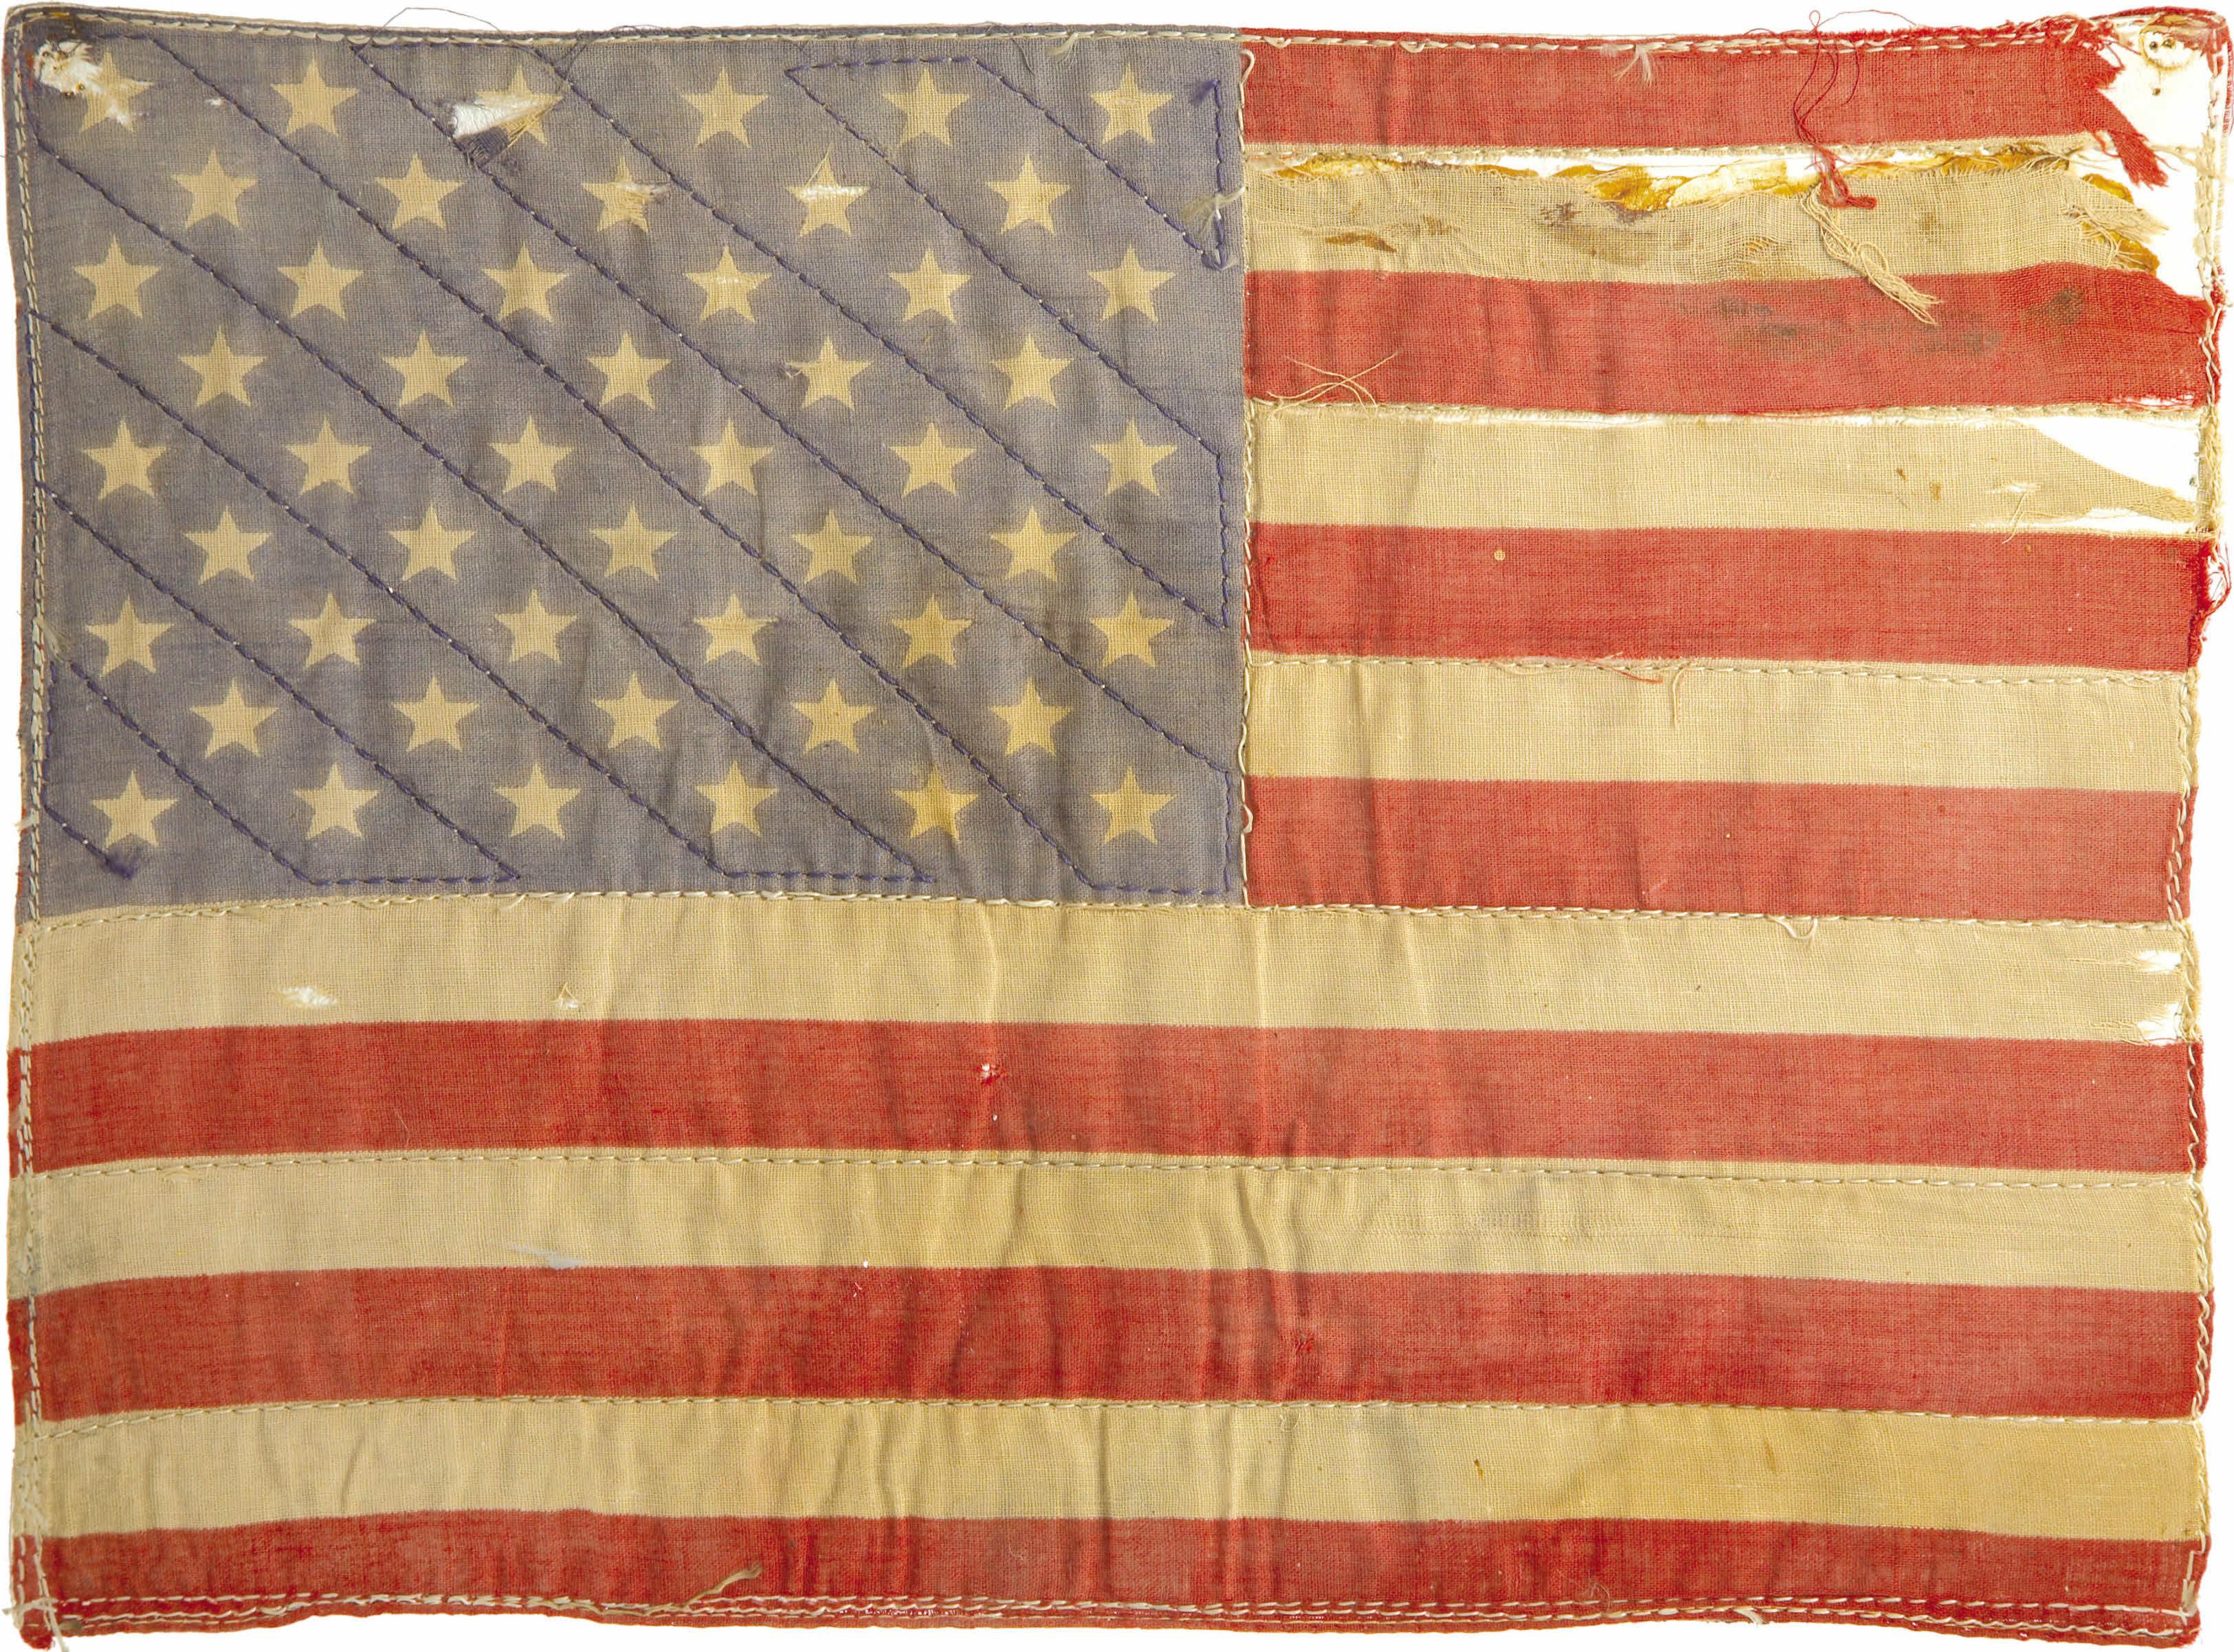 Peter_Fonda's_American_Flag_Patch